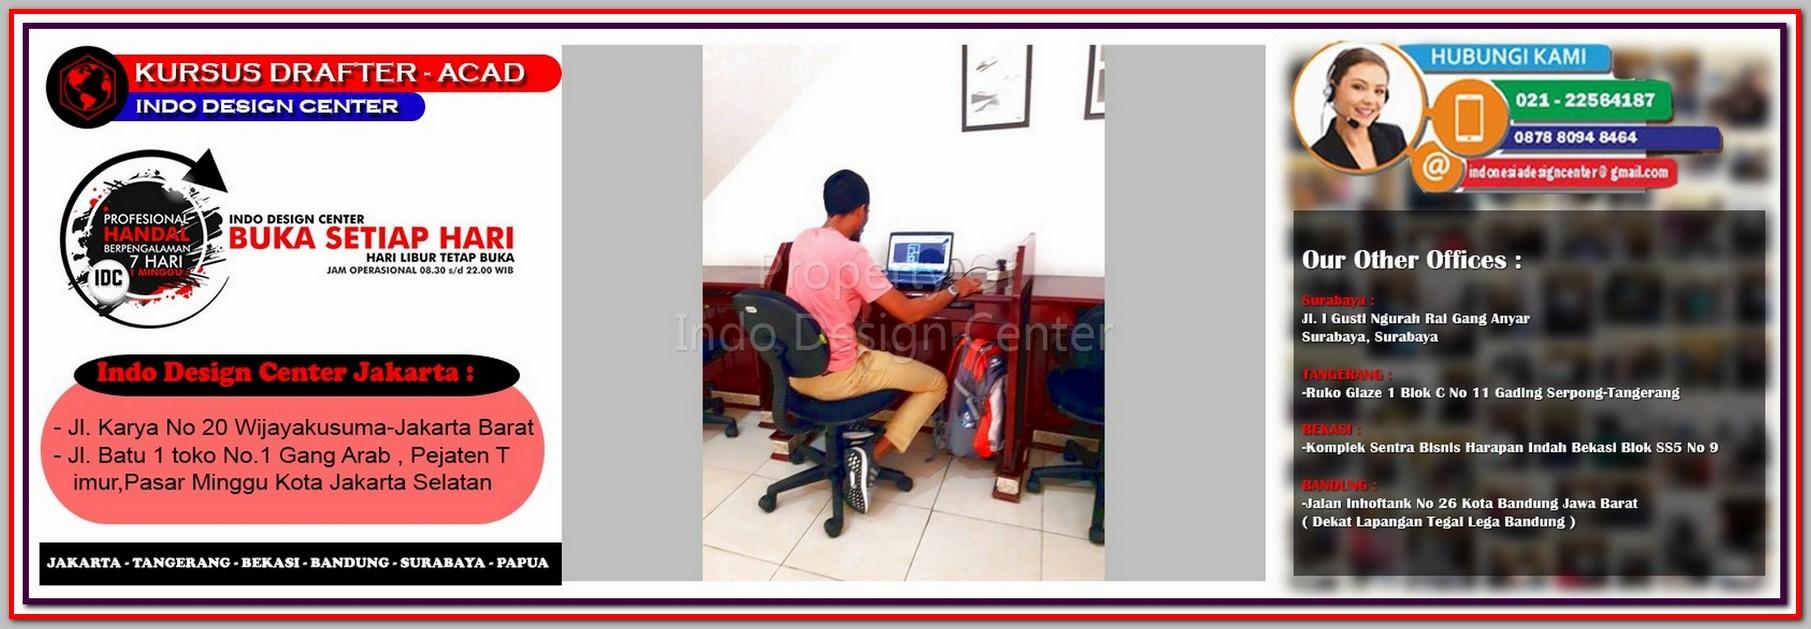 Kursus Arsitektur Di Kemayoran - Jakarta - Tangerang - Bekasi - Bandung - Surabaya